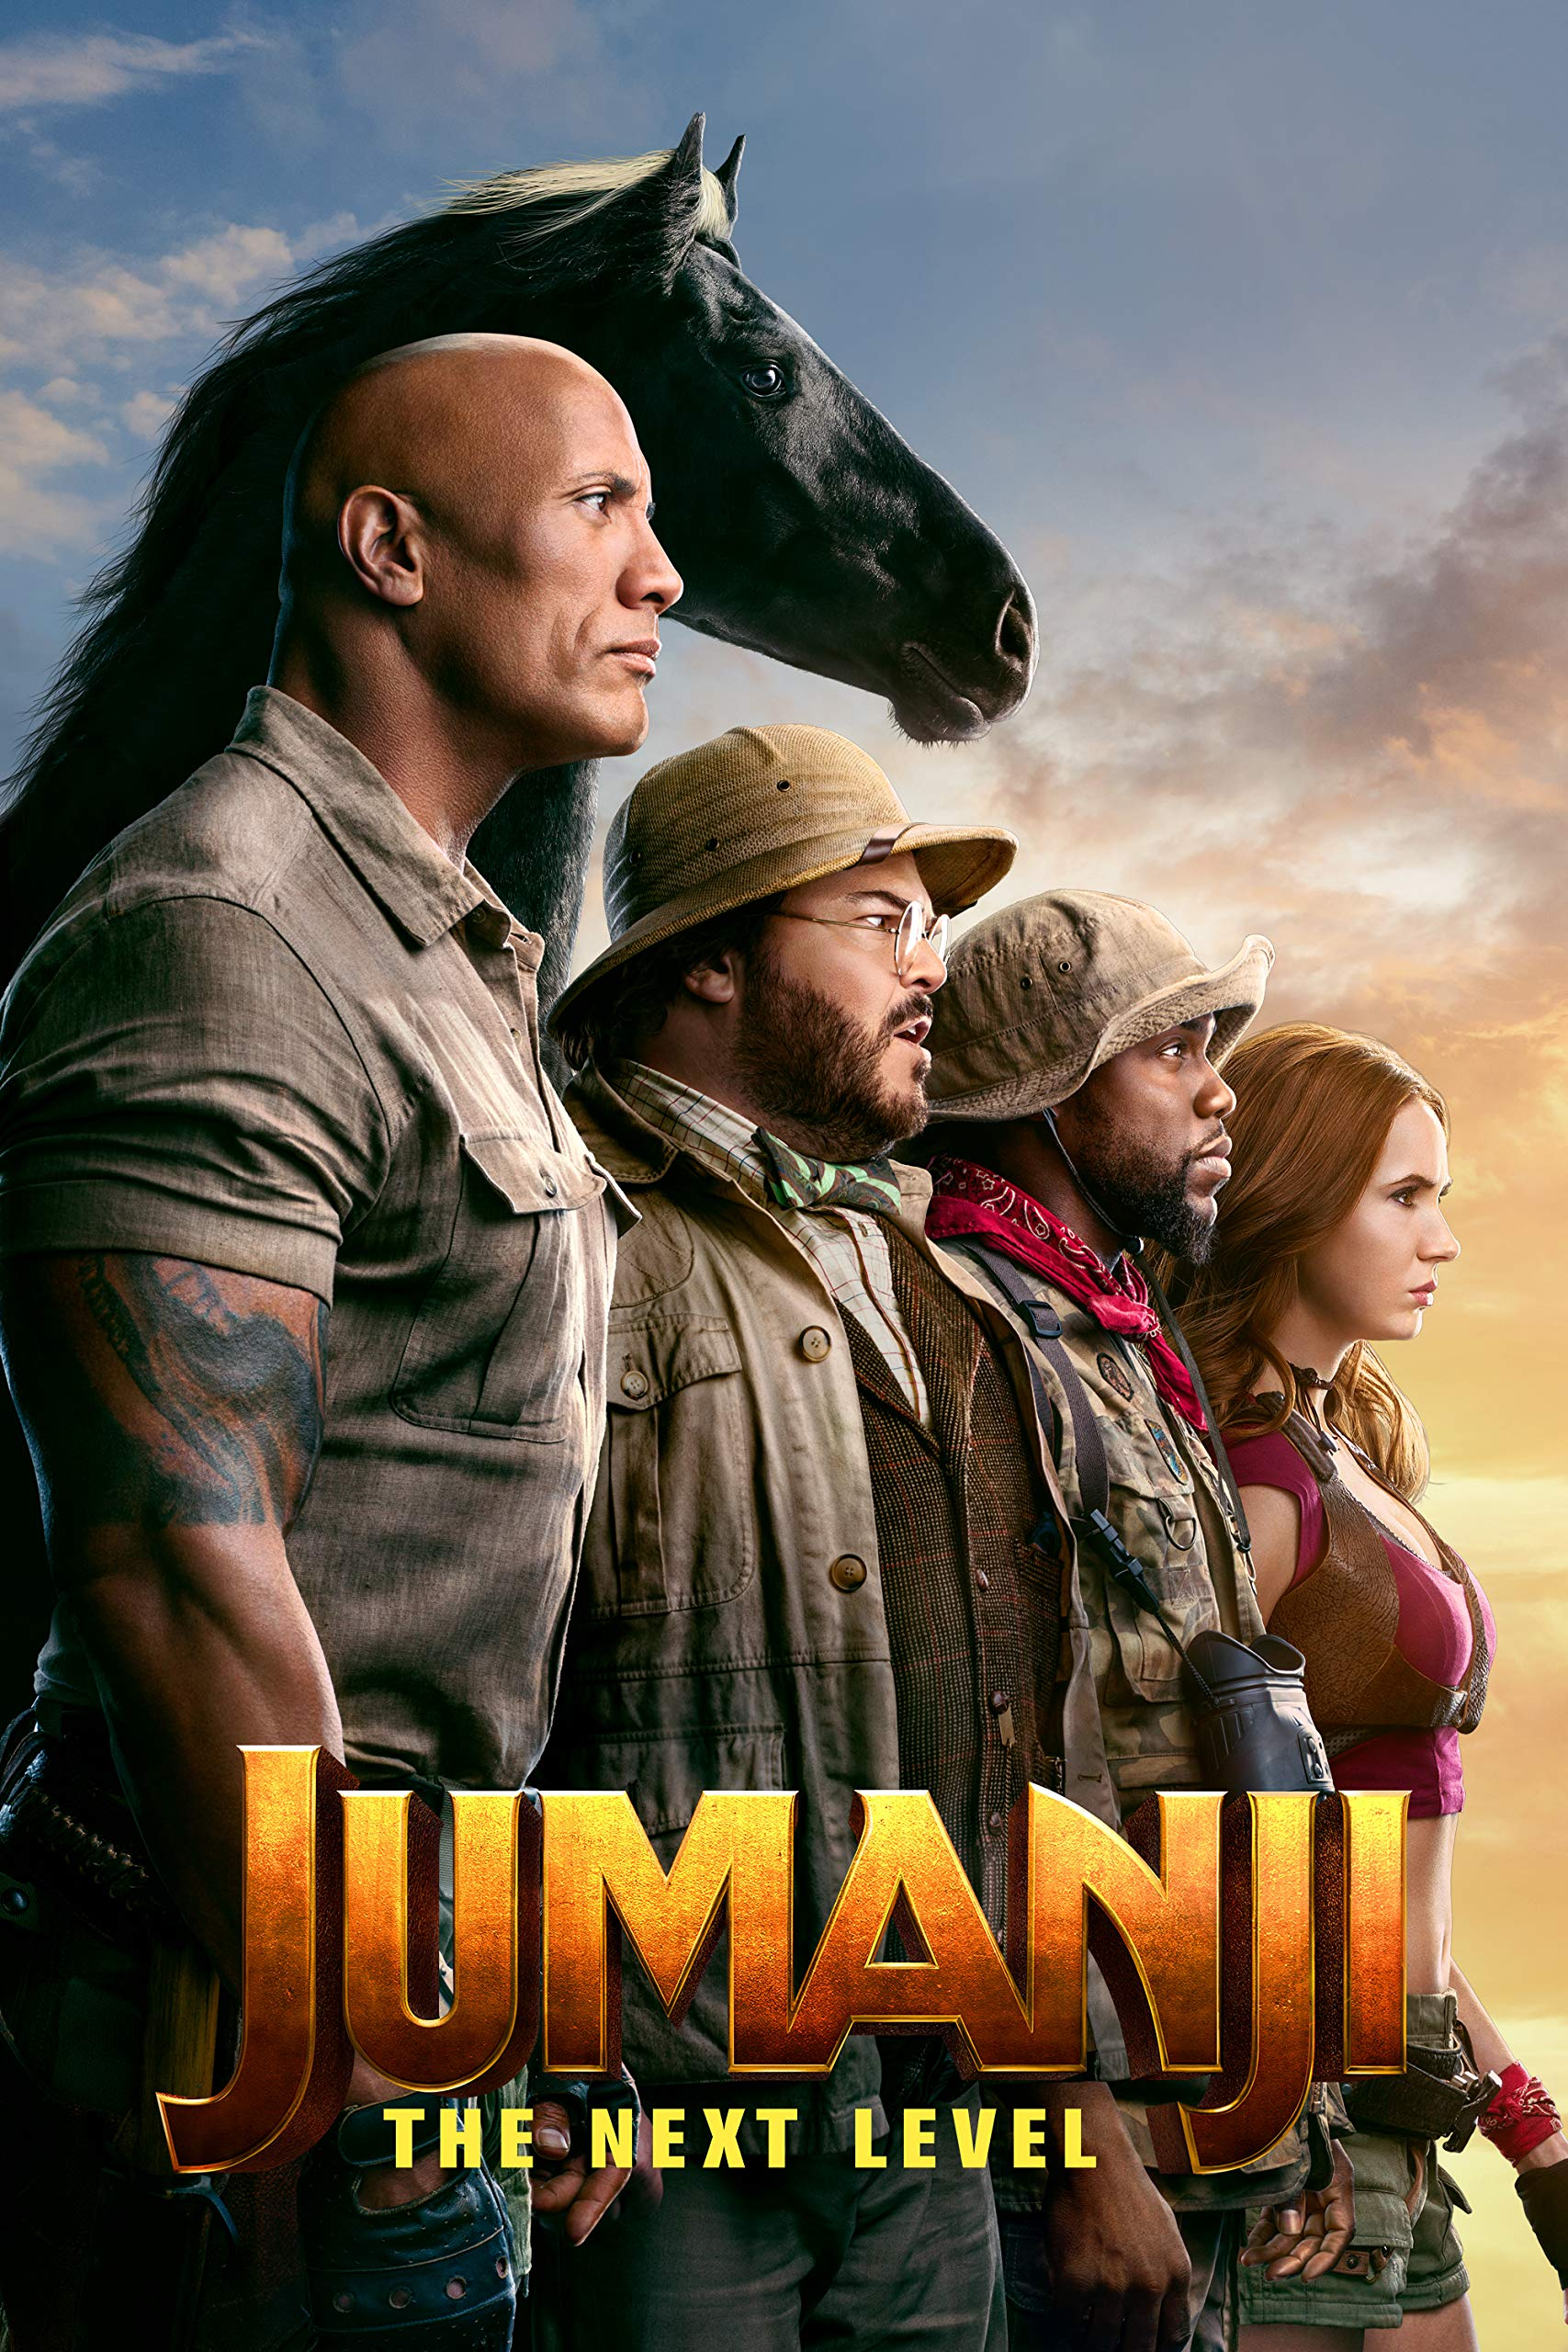 Book Cover: Jumanji: The Next Level